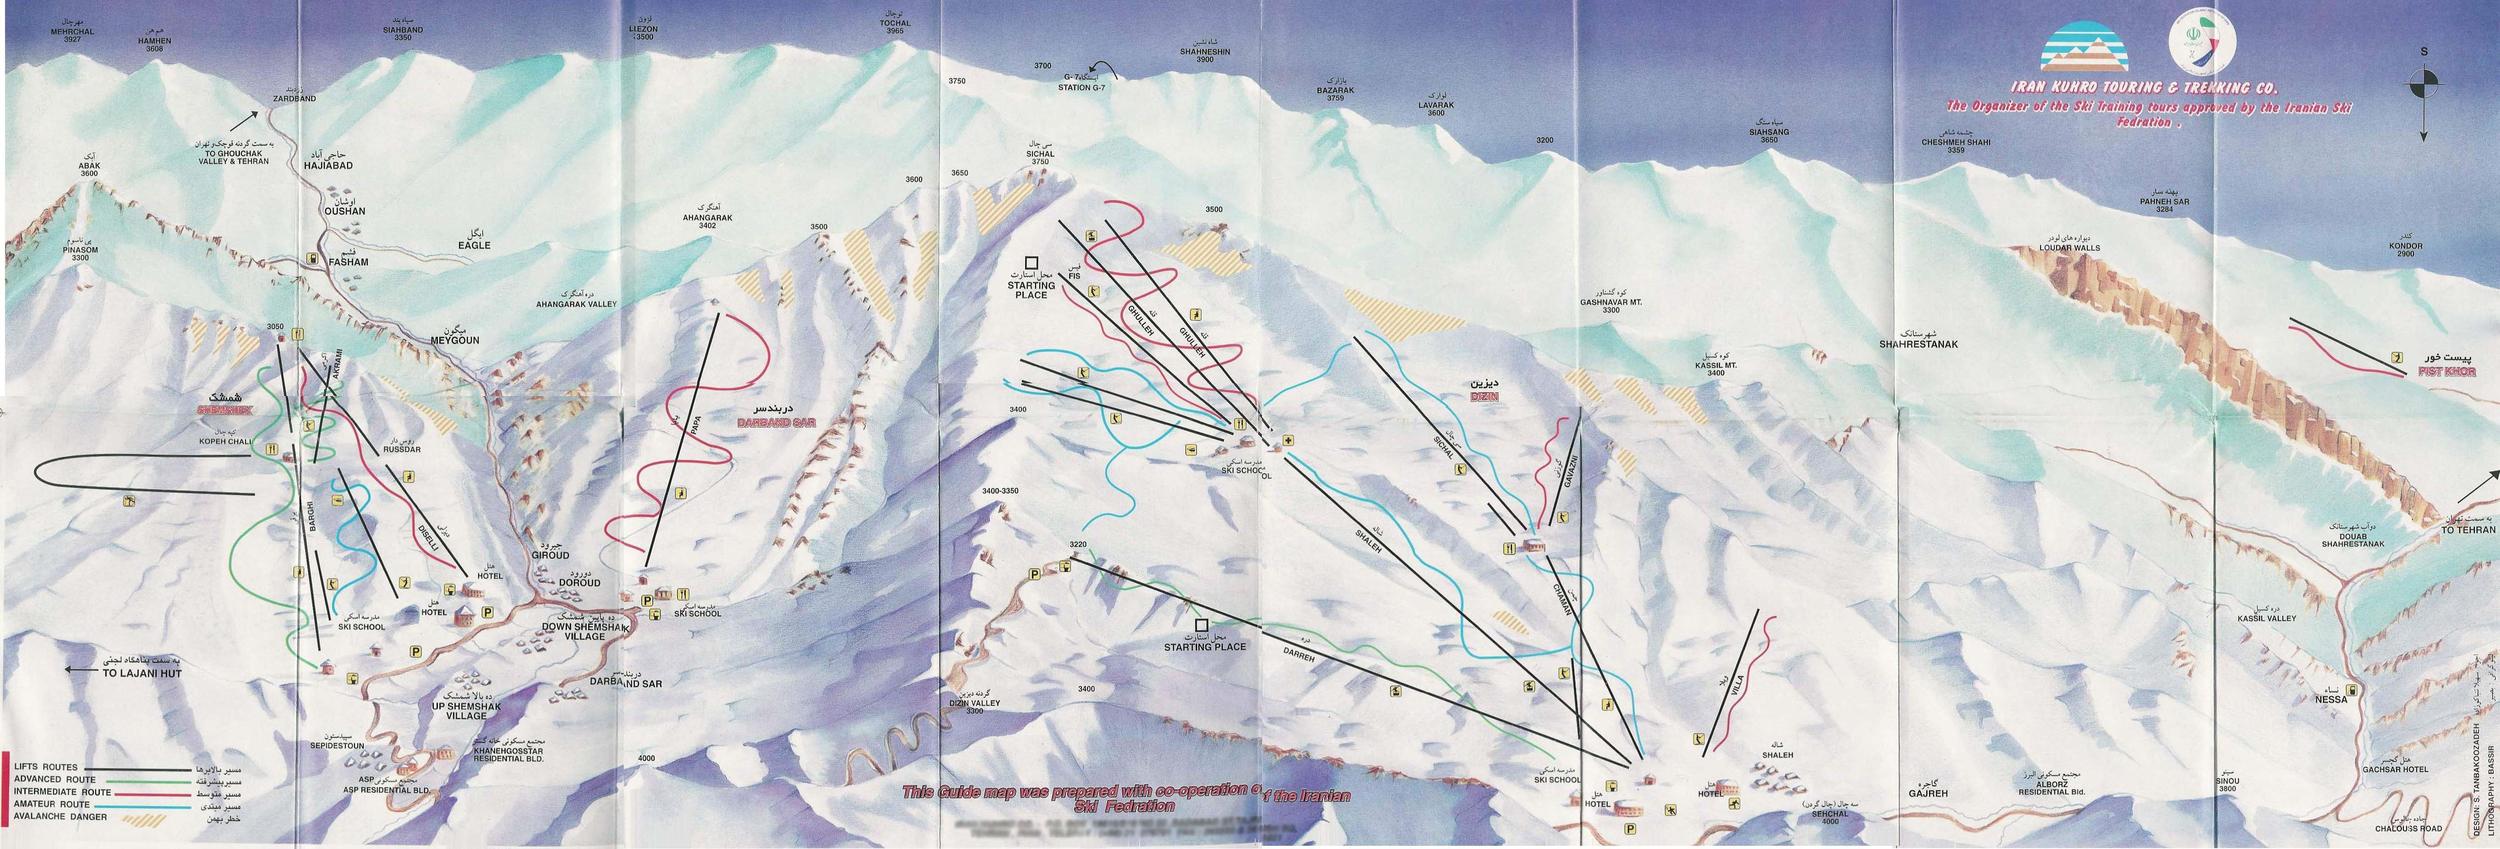 Dizin Ski Resort, Alborz Mountains, Iran